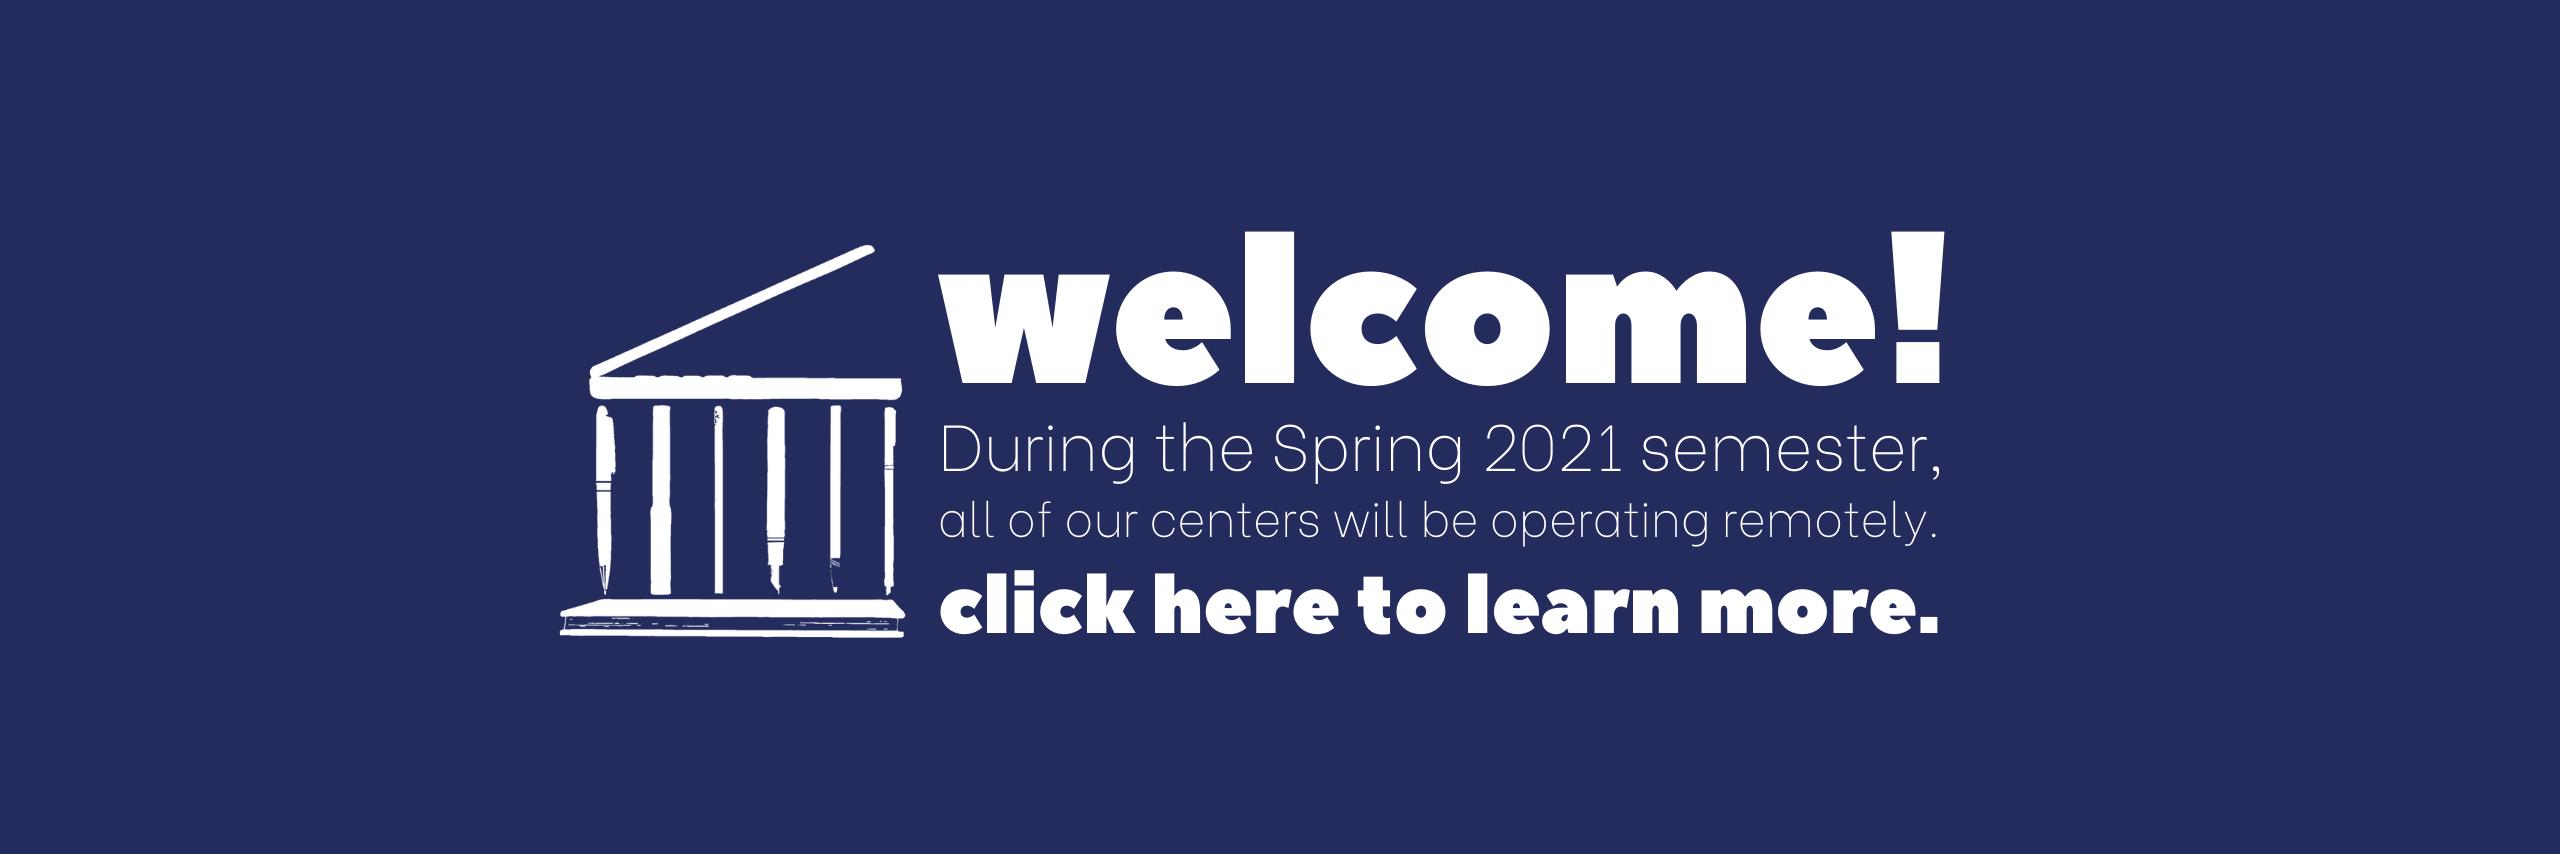 web banner - spring 2021